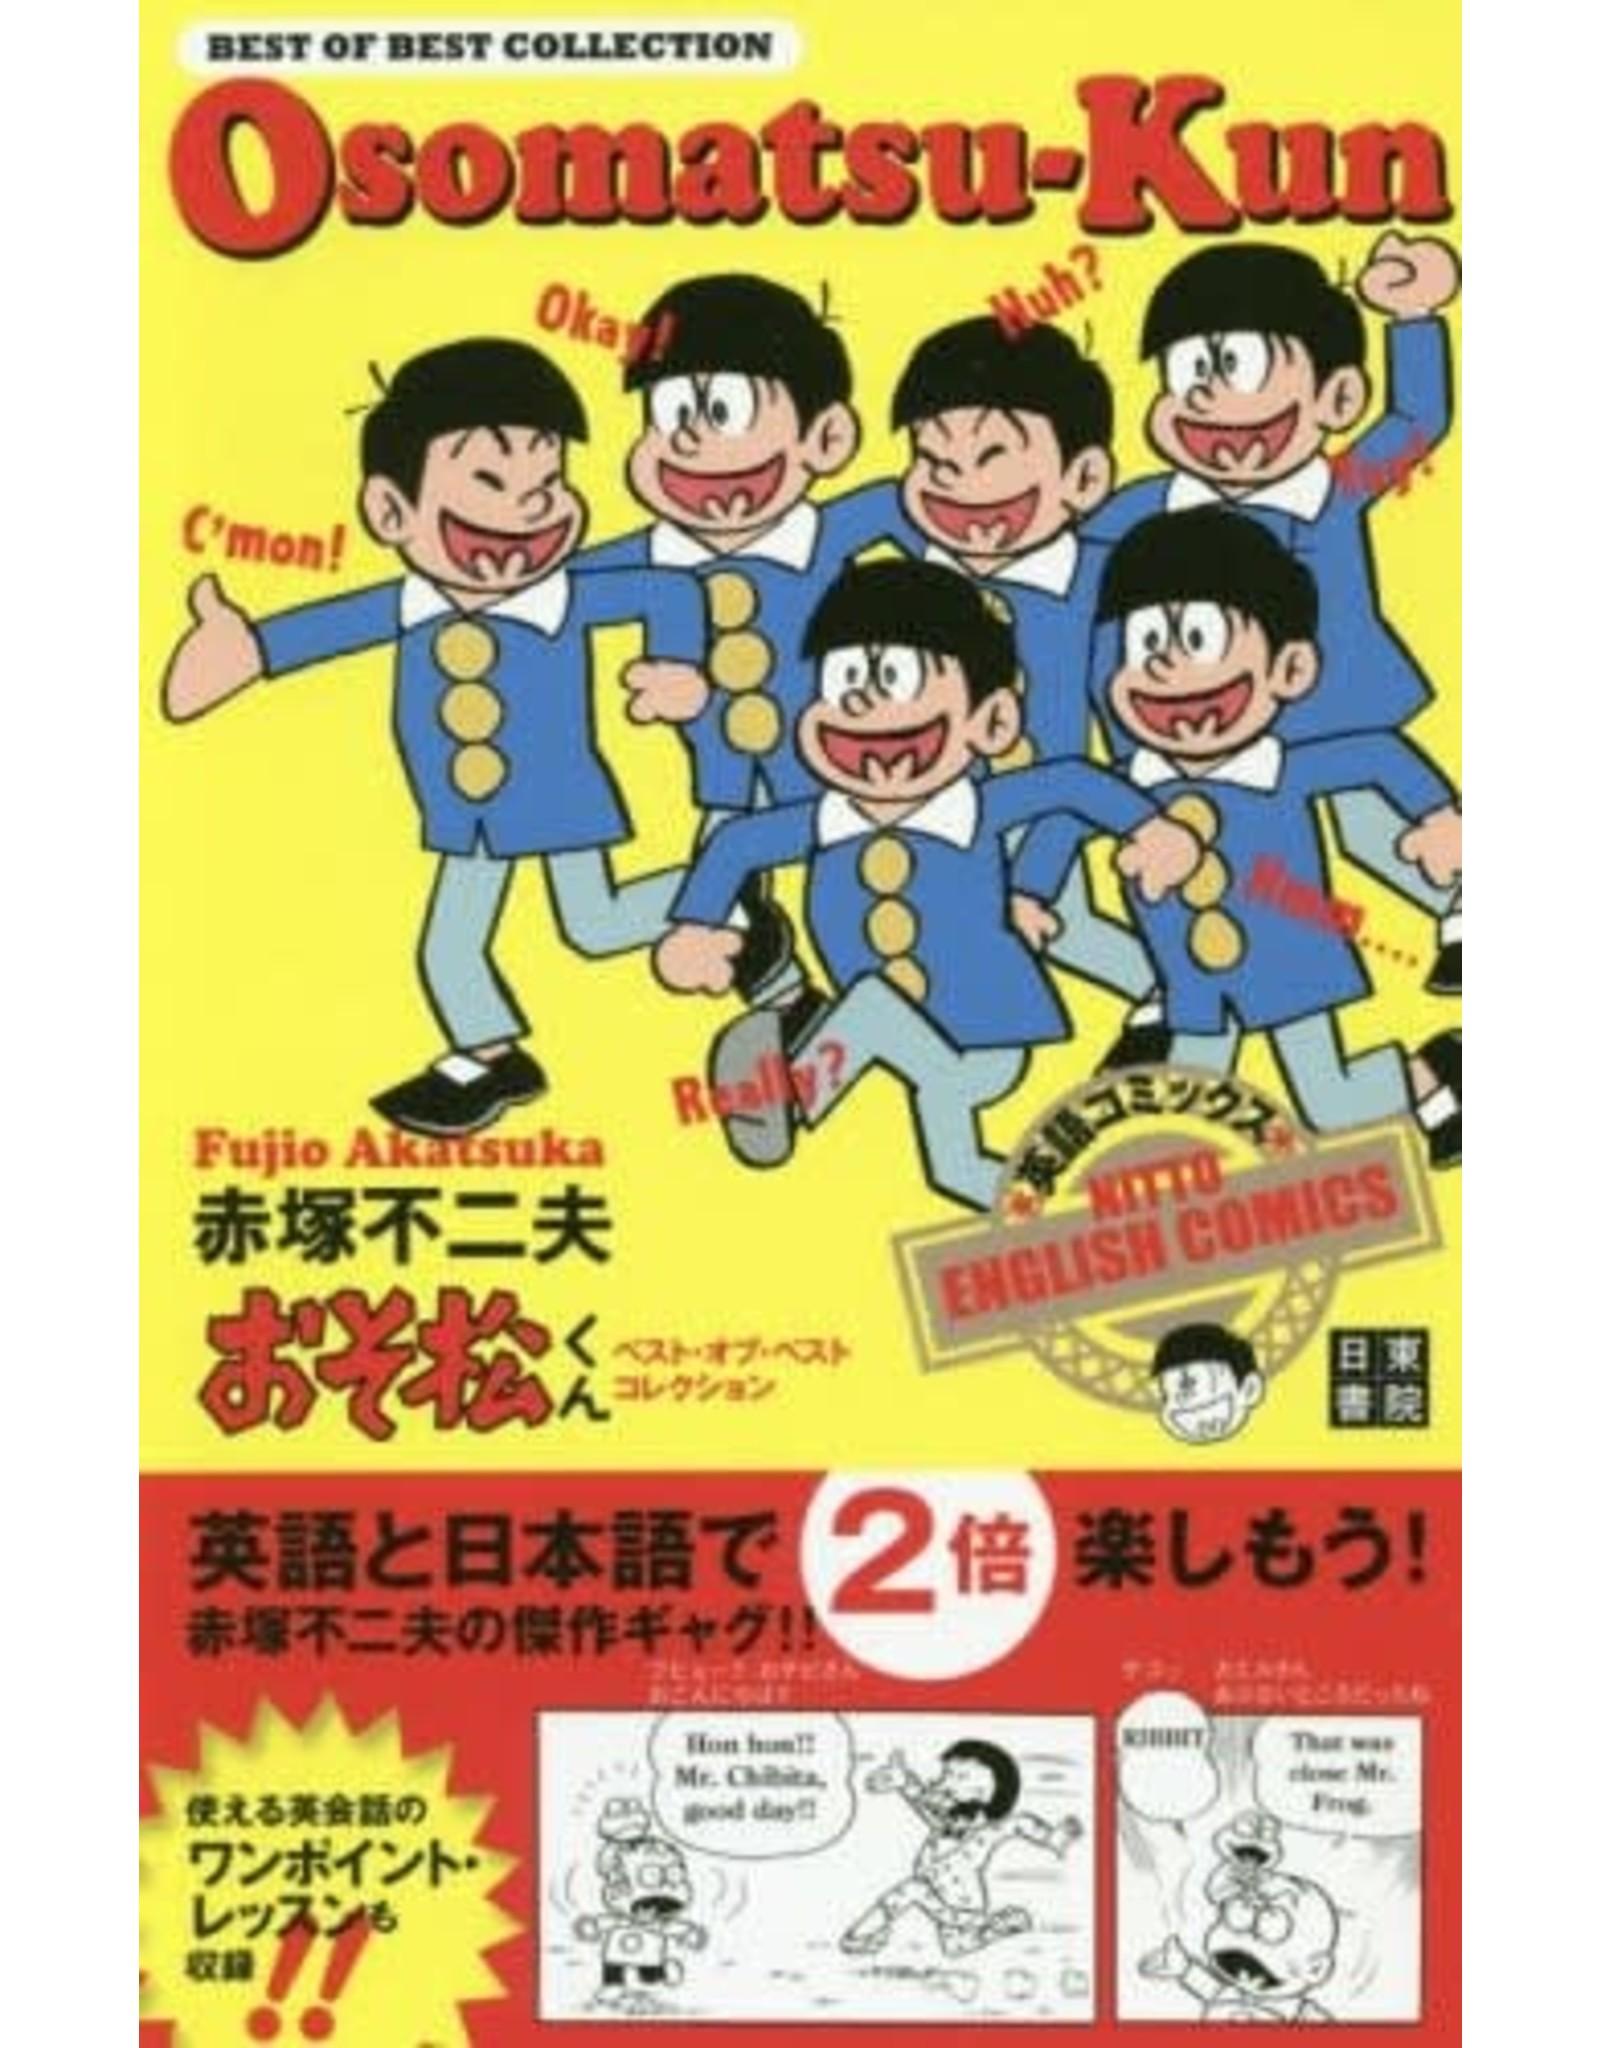 TATSUMI PUBLISHING [BILINGUAL] OSOMATSU-KUN BEST OF BEST COLLECTION